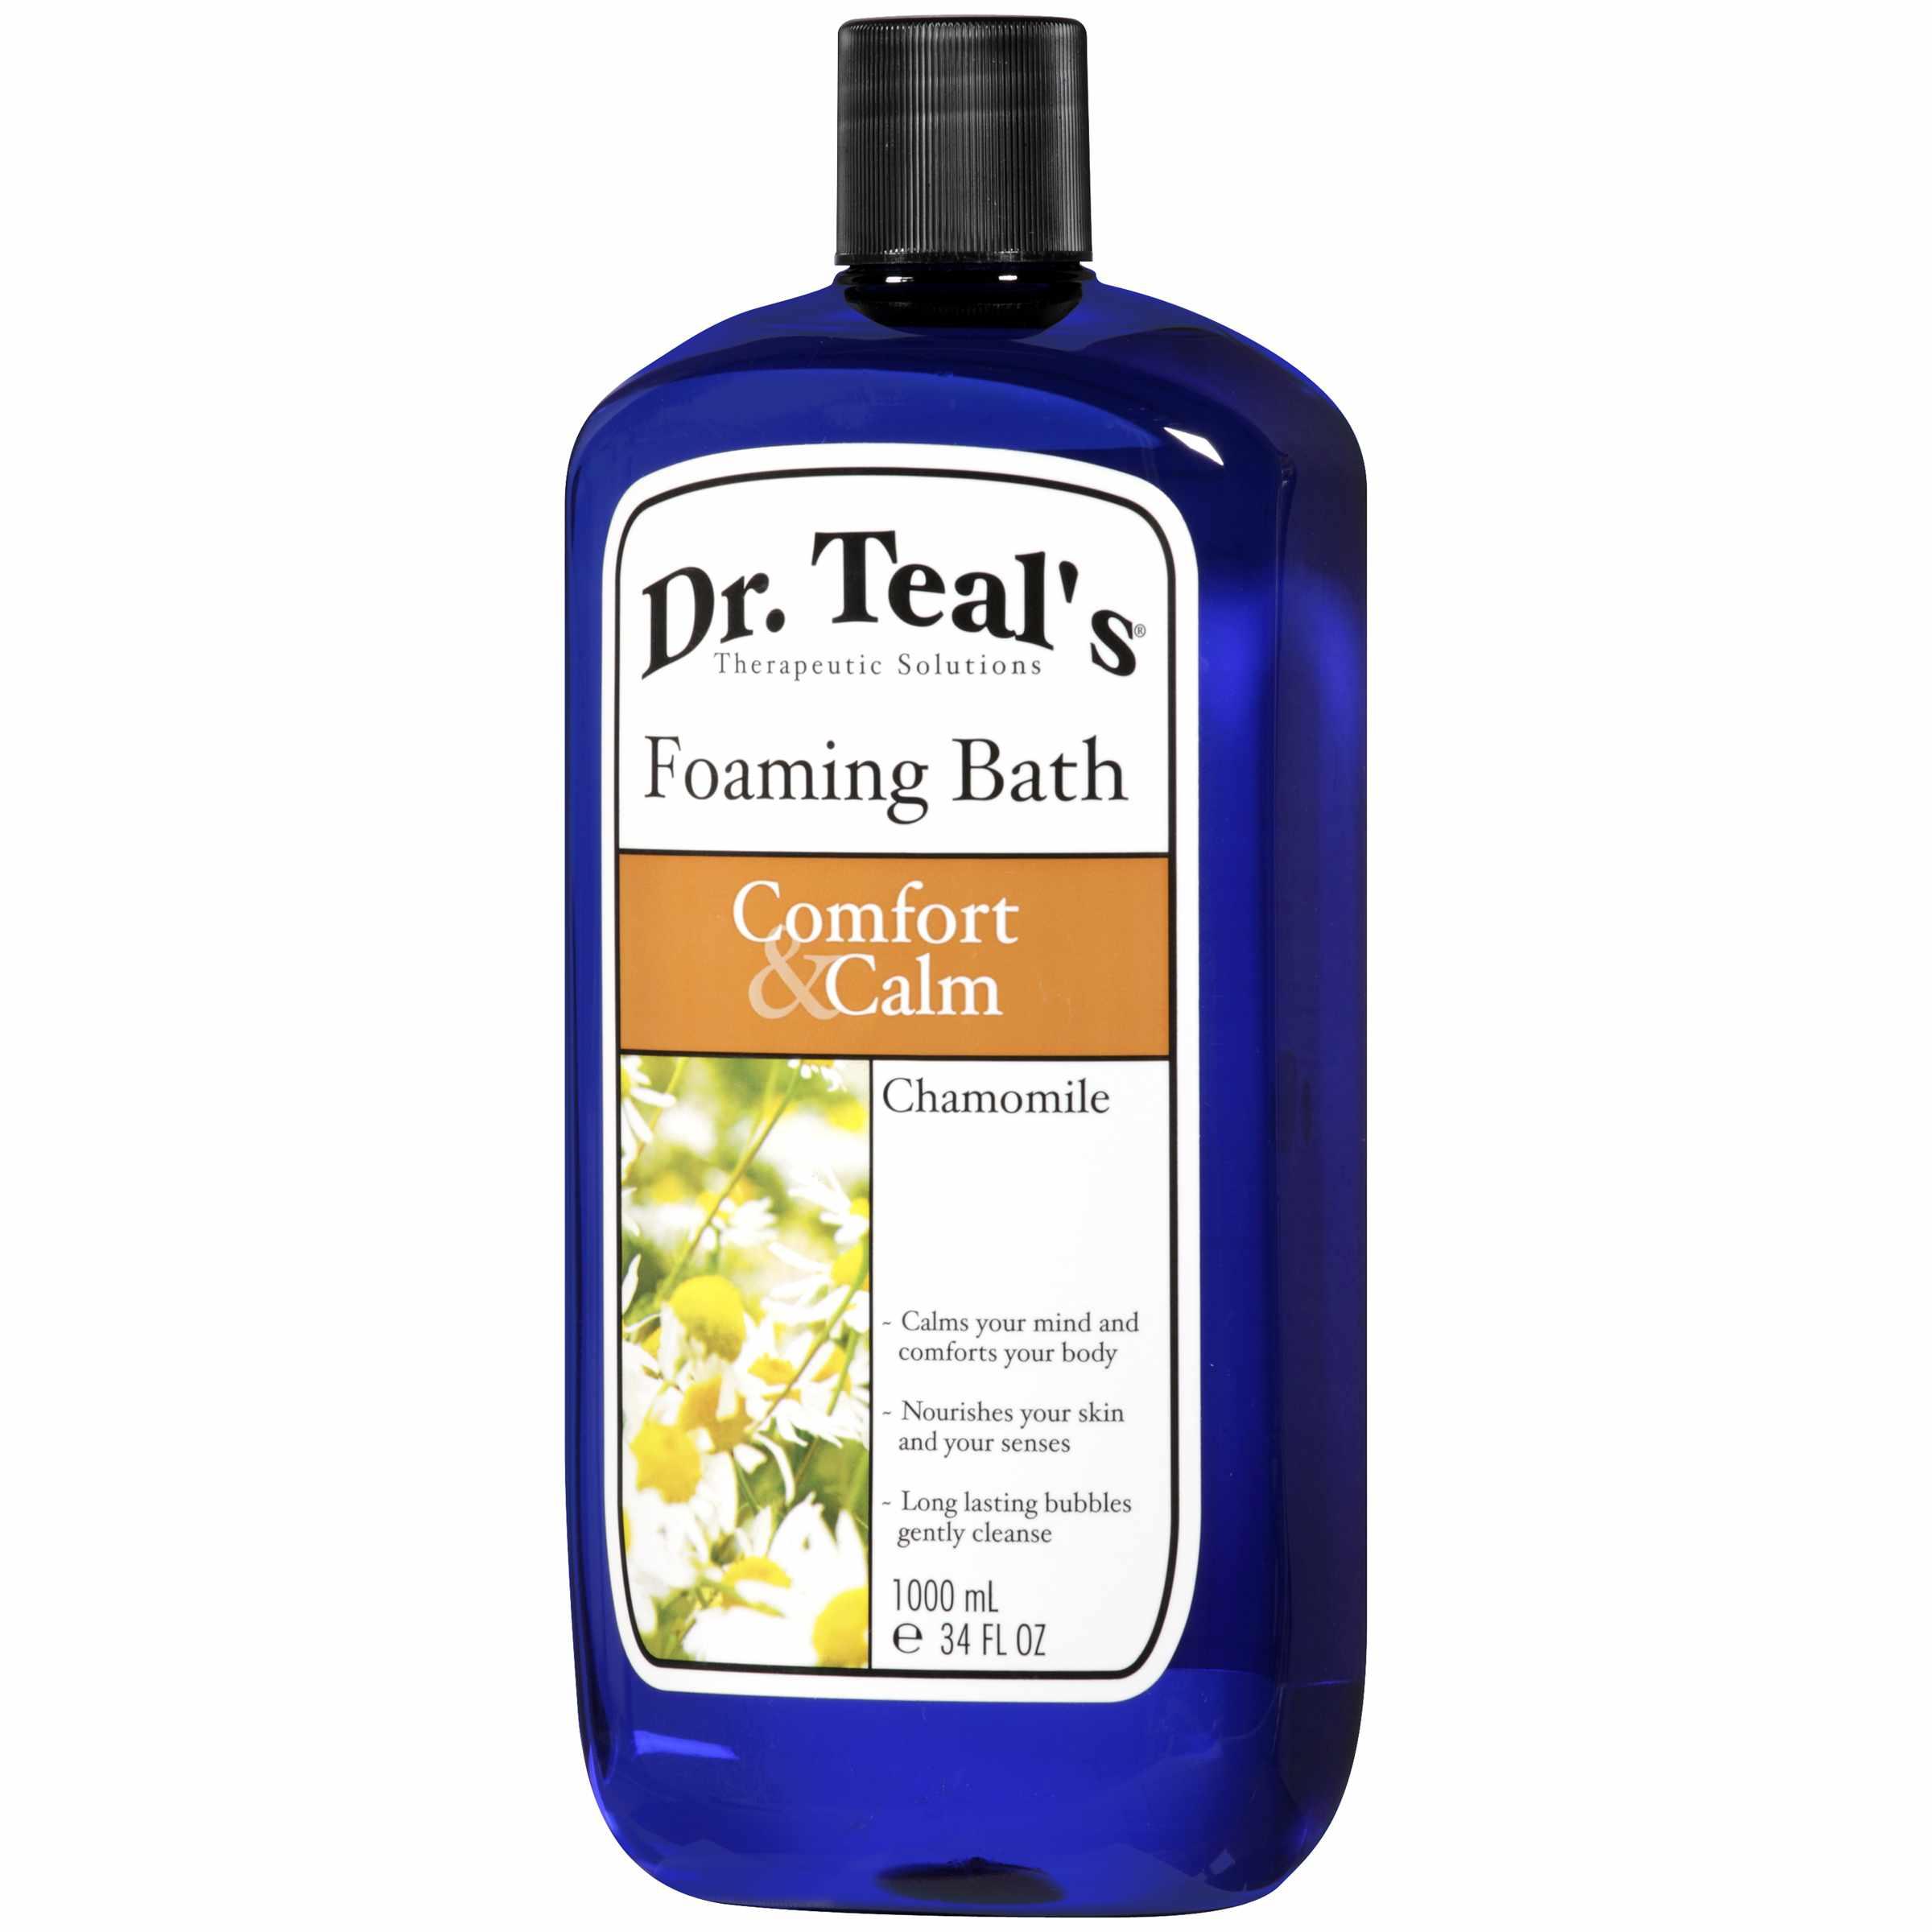 Dr. Teal's